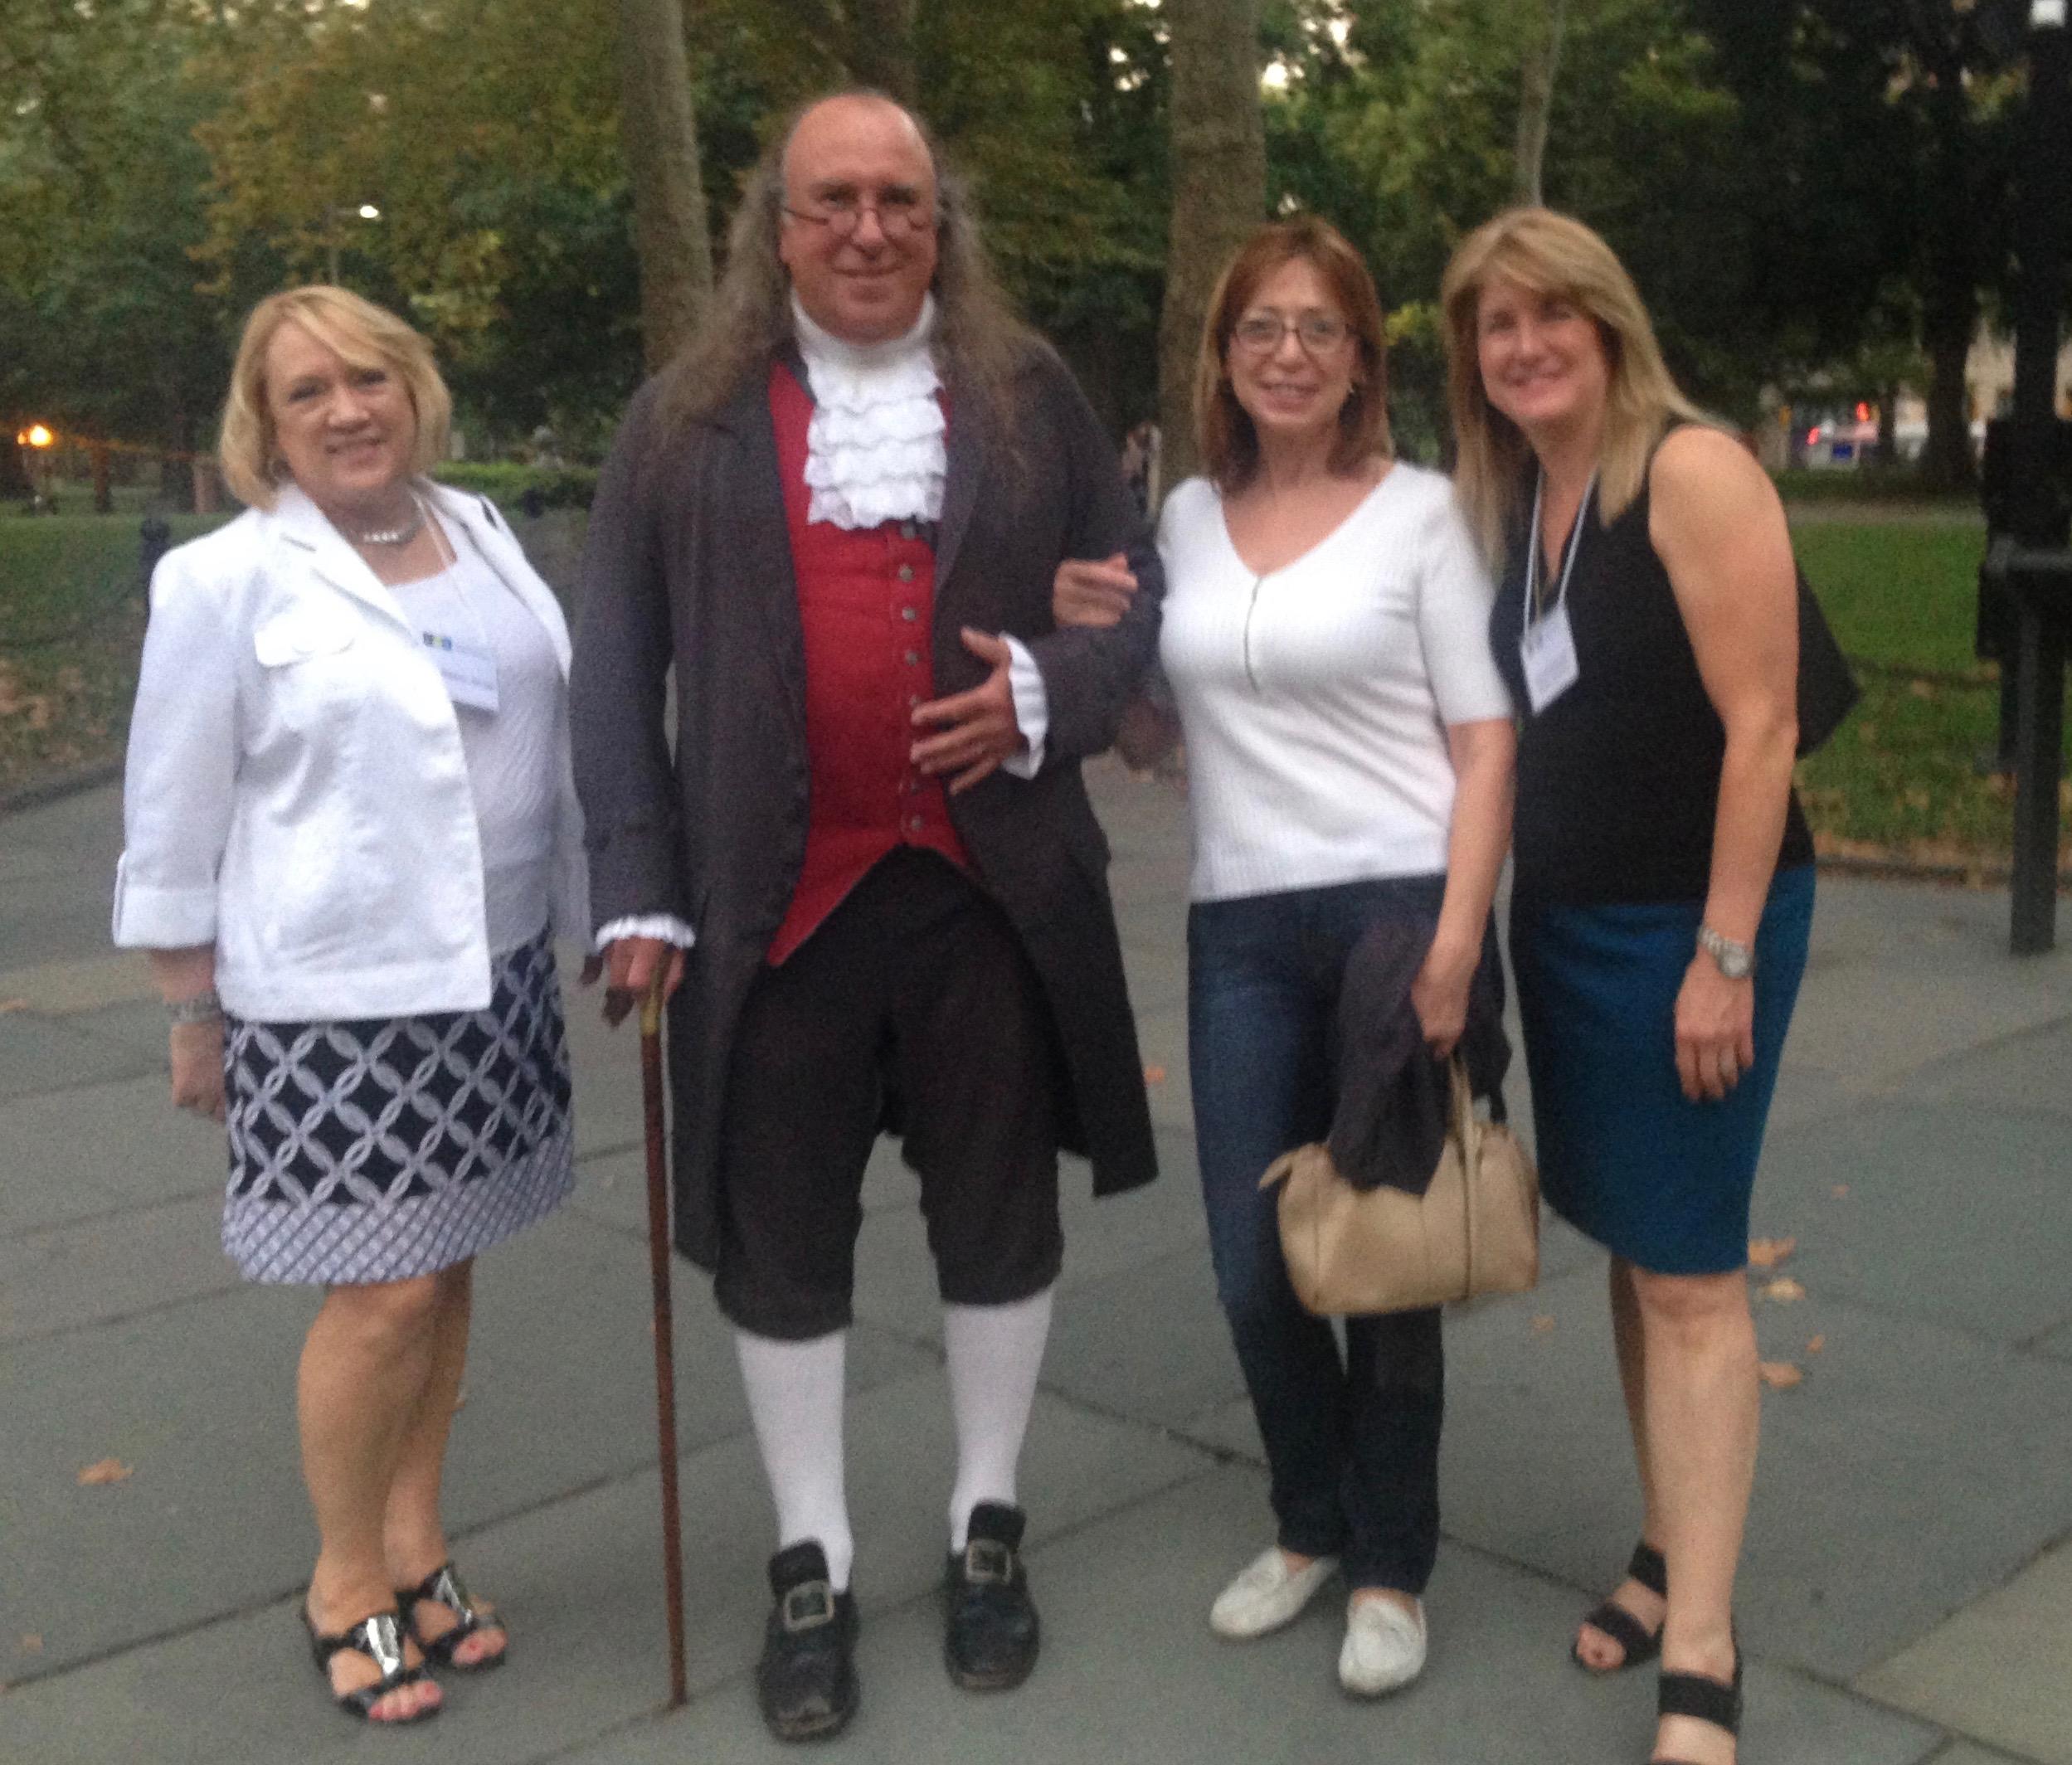 When in Philadelphia, you have to meet Ben Franklin